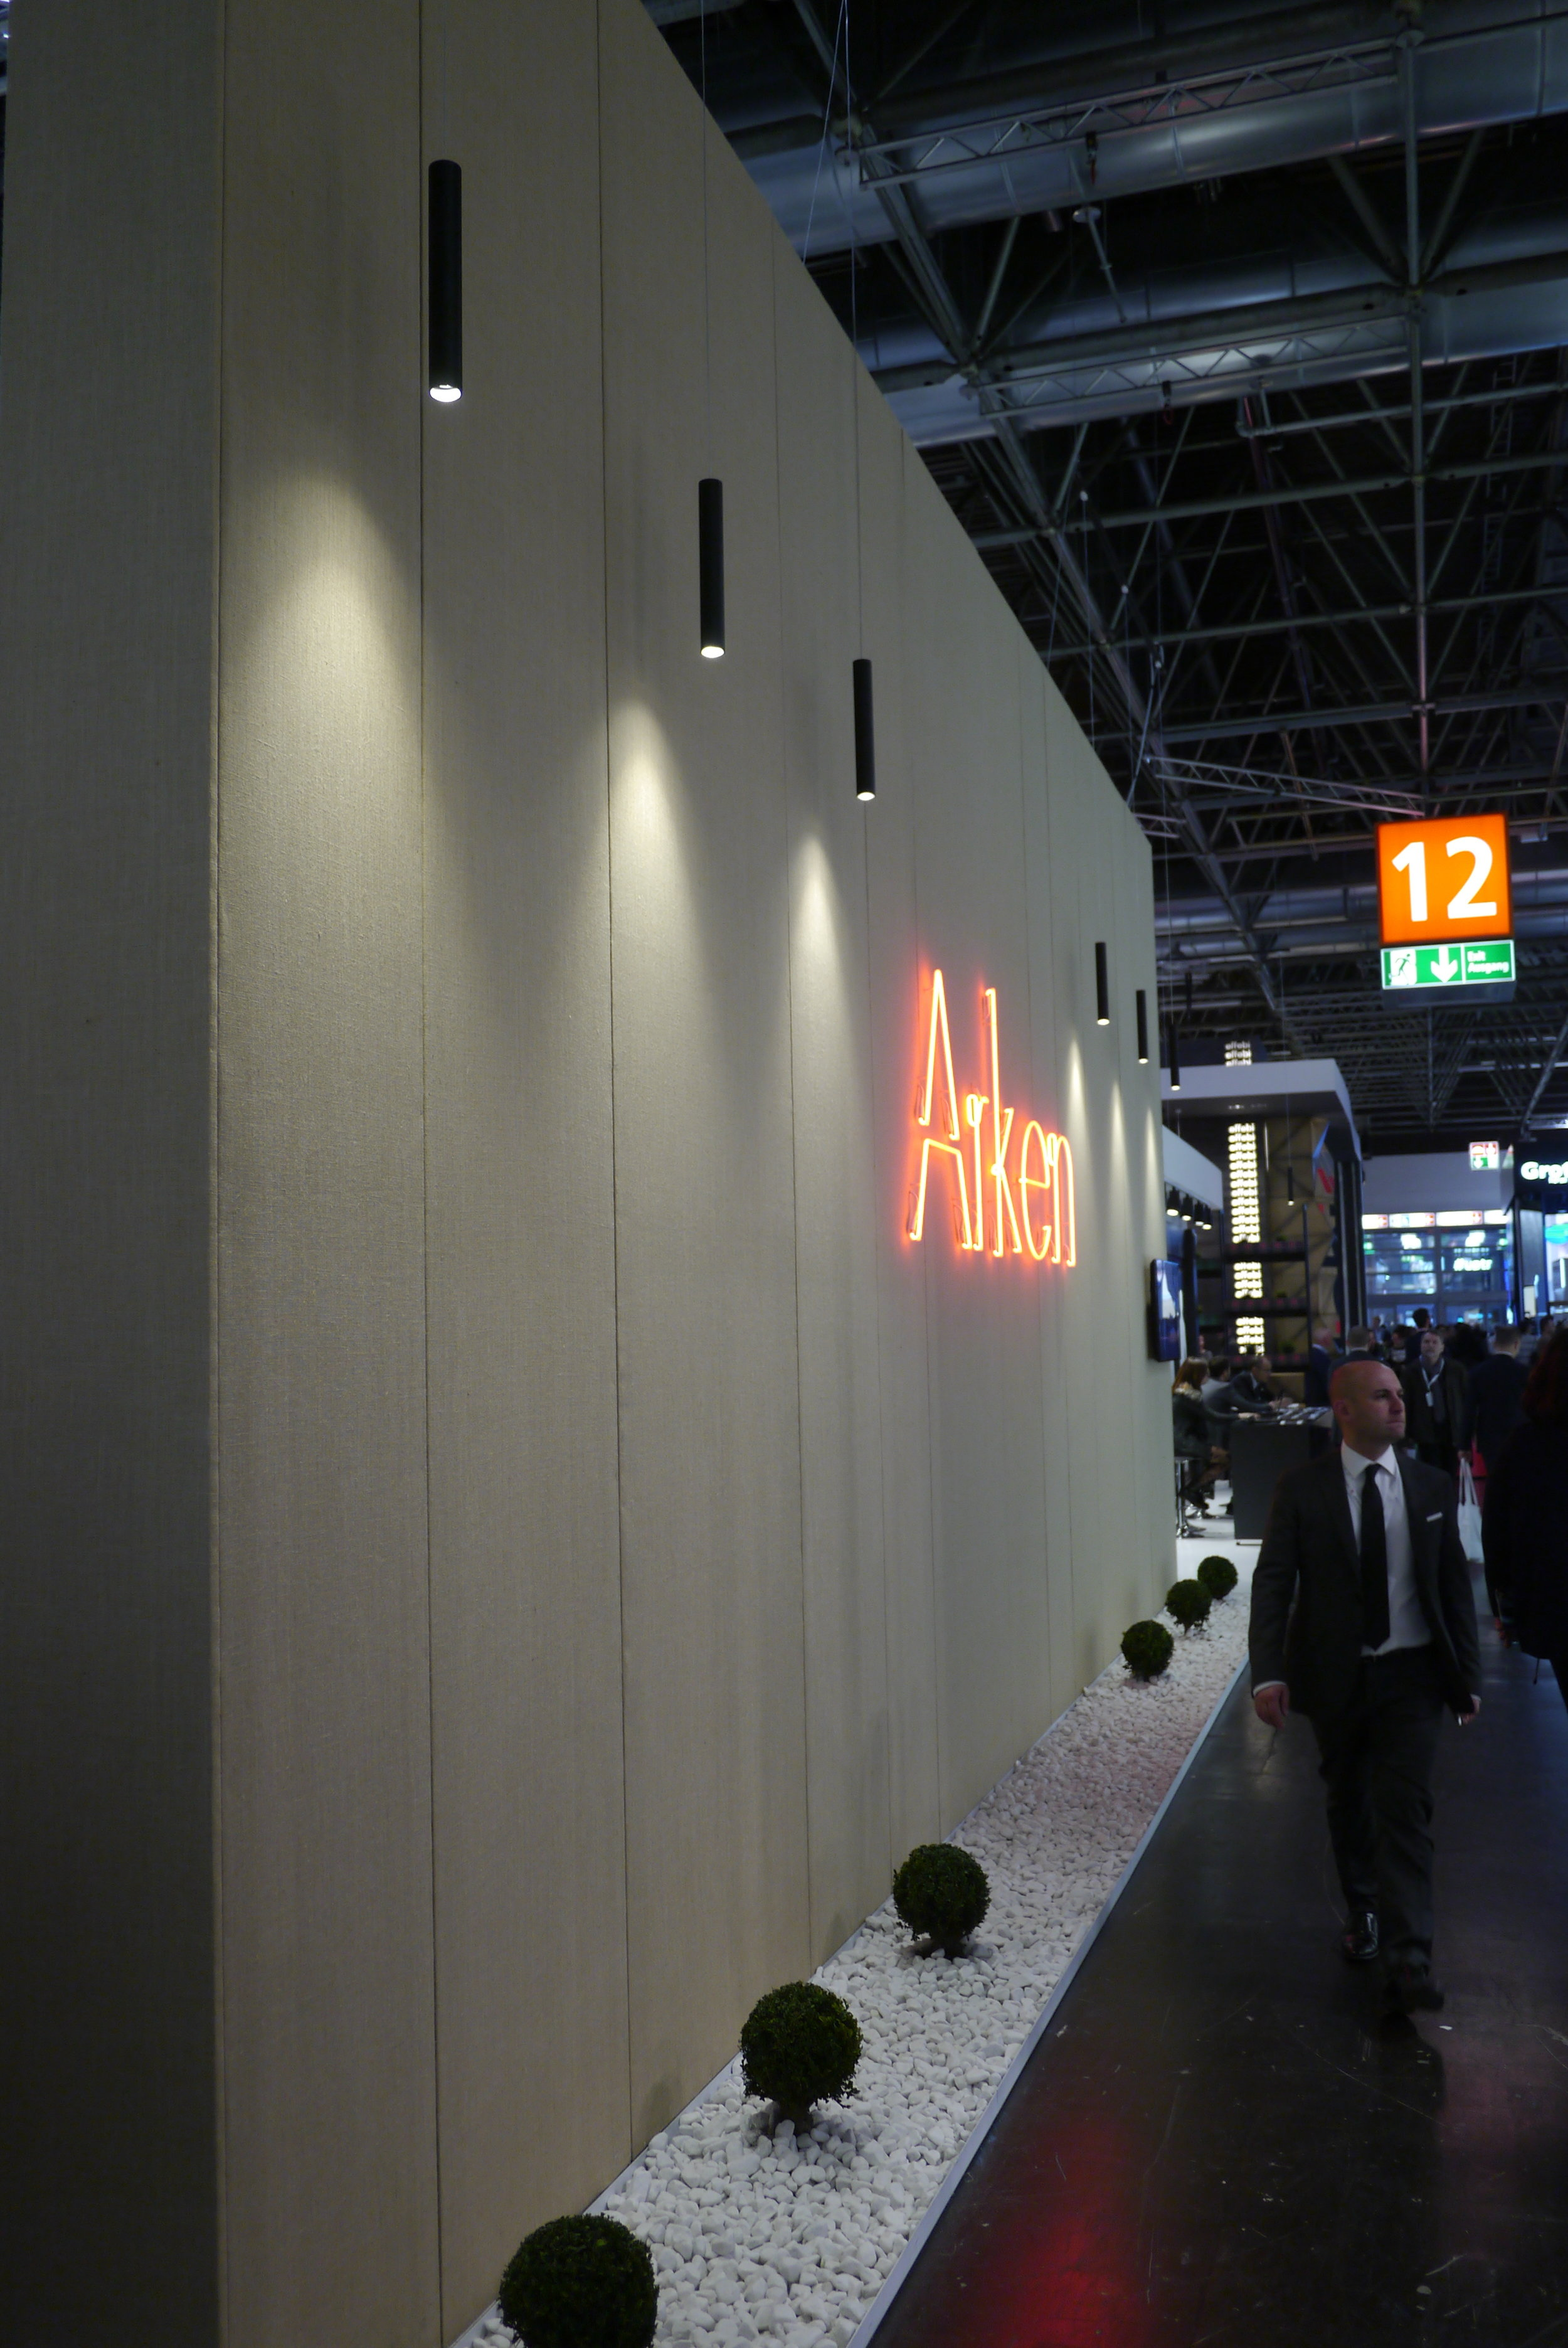 P1120432.JPG